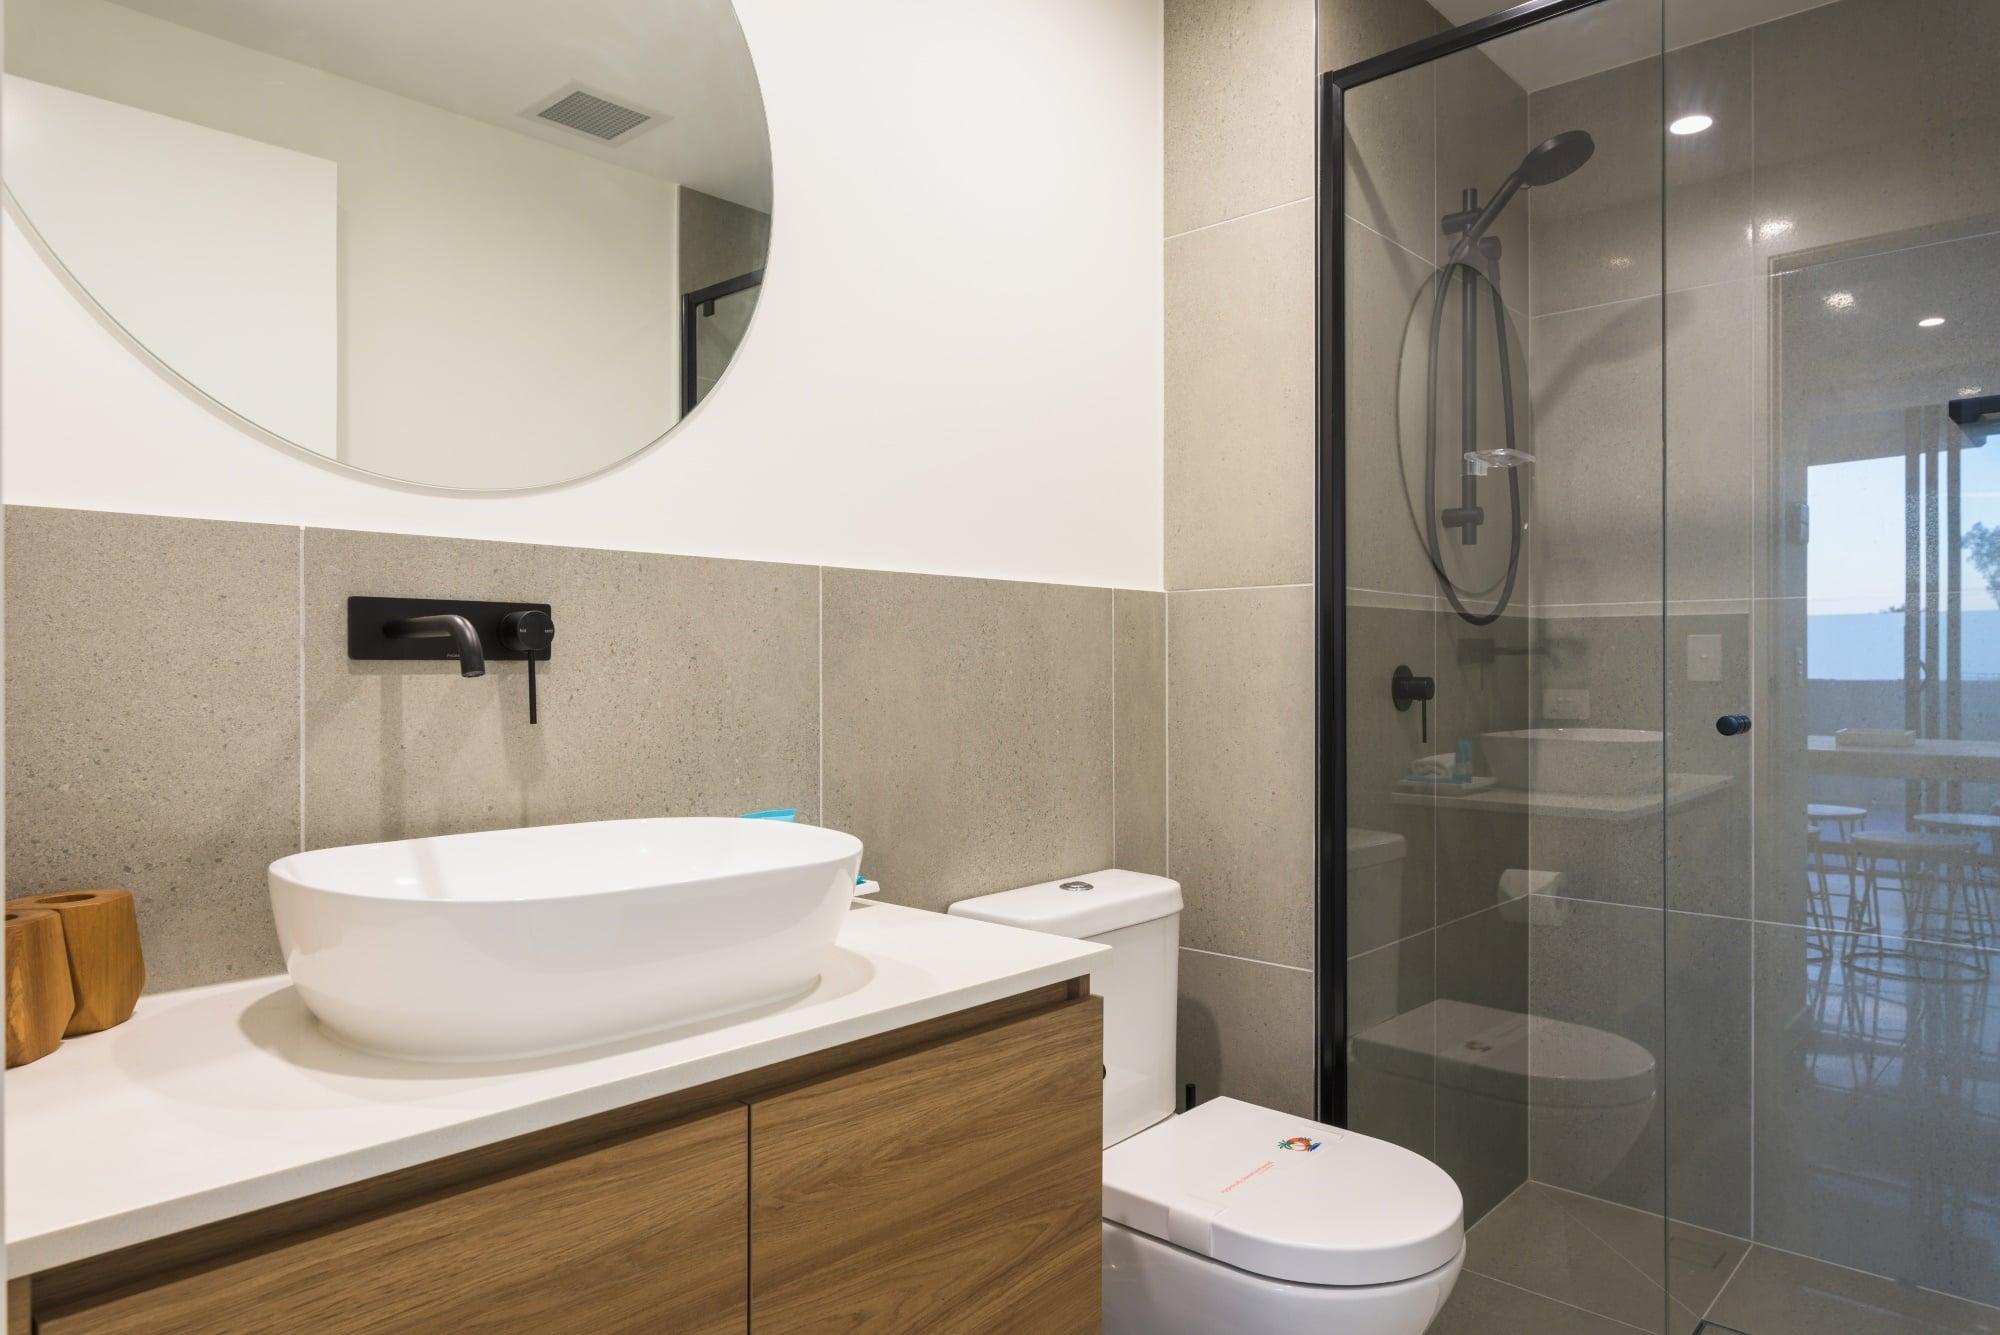 apartment-104-allure-mooloolaba-13